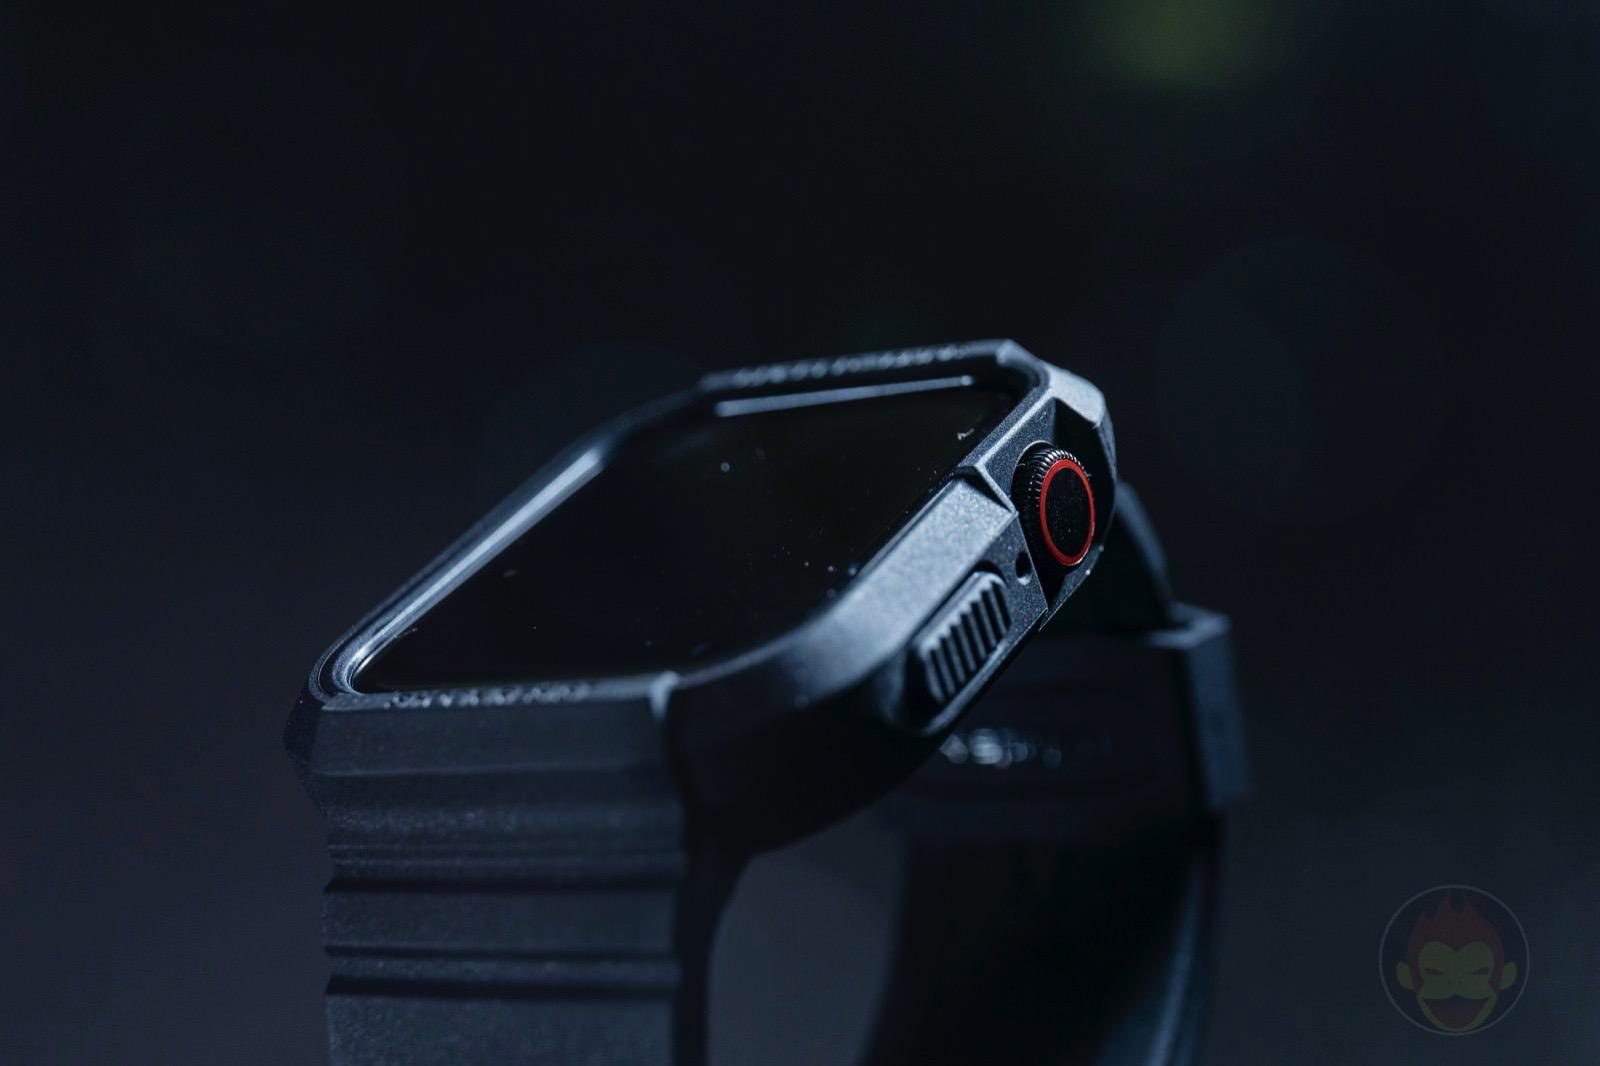 Spigen-Rugged-Armor-Pro-Apple-Watch-Band-and-case-10.jpg